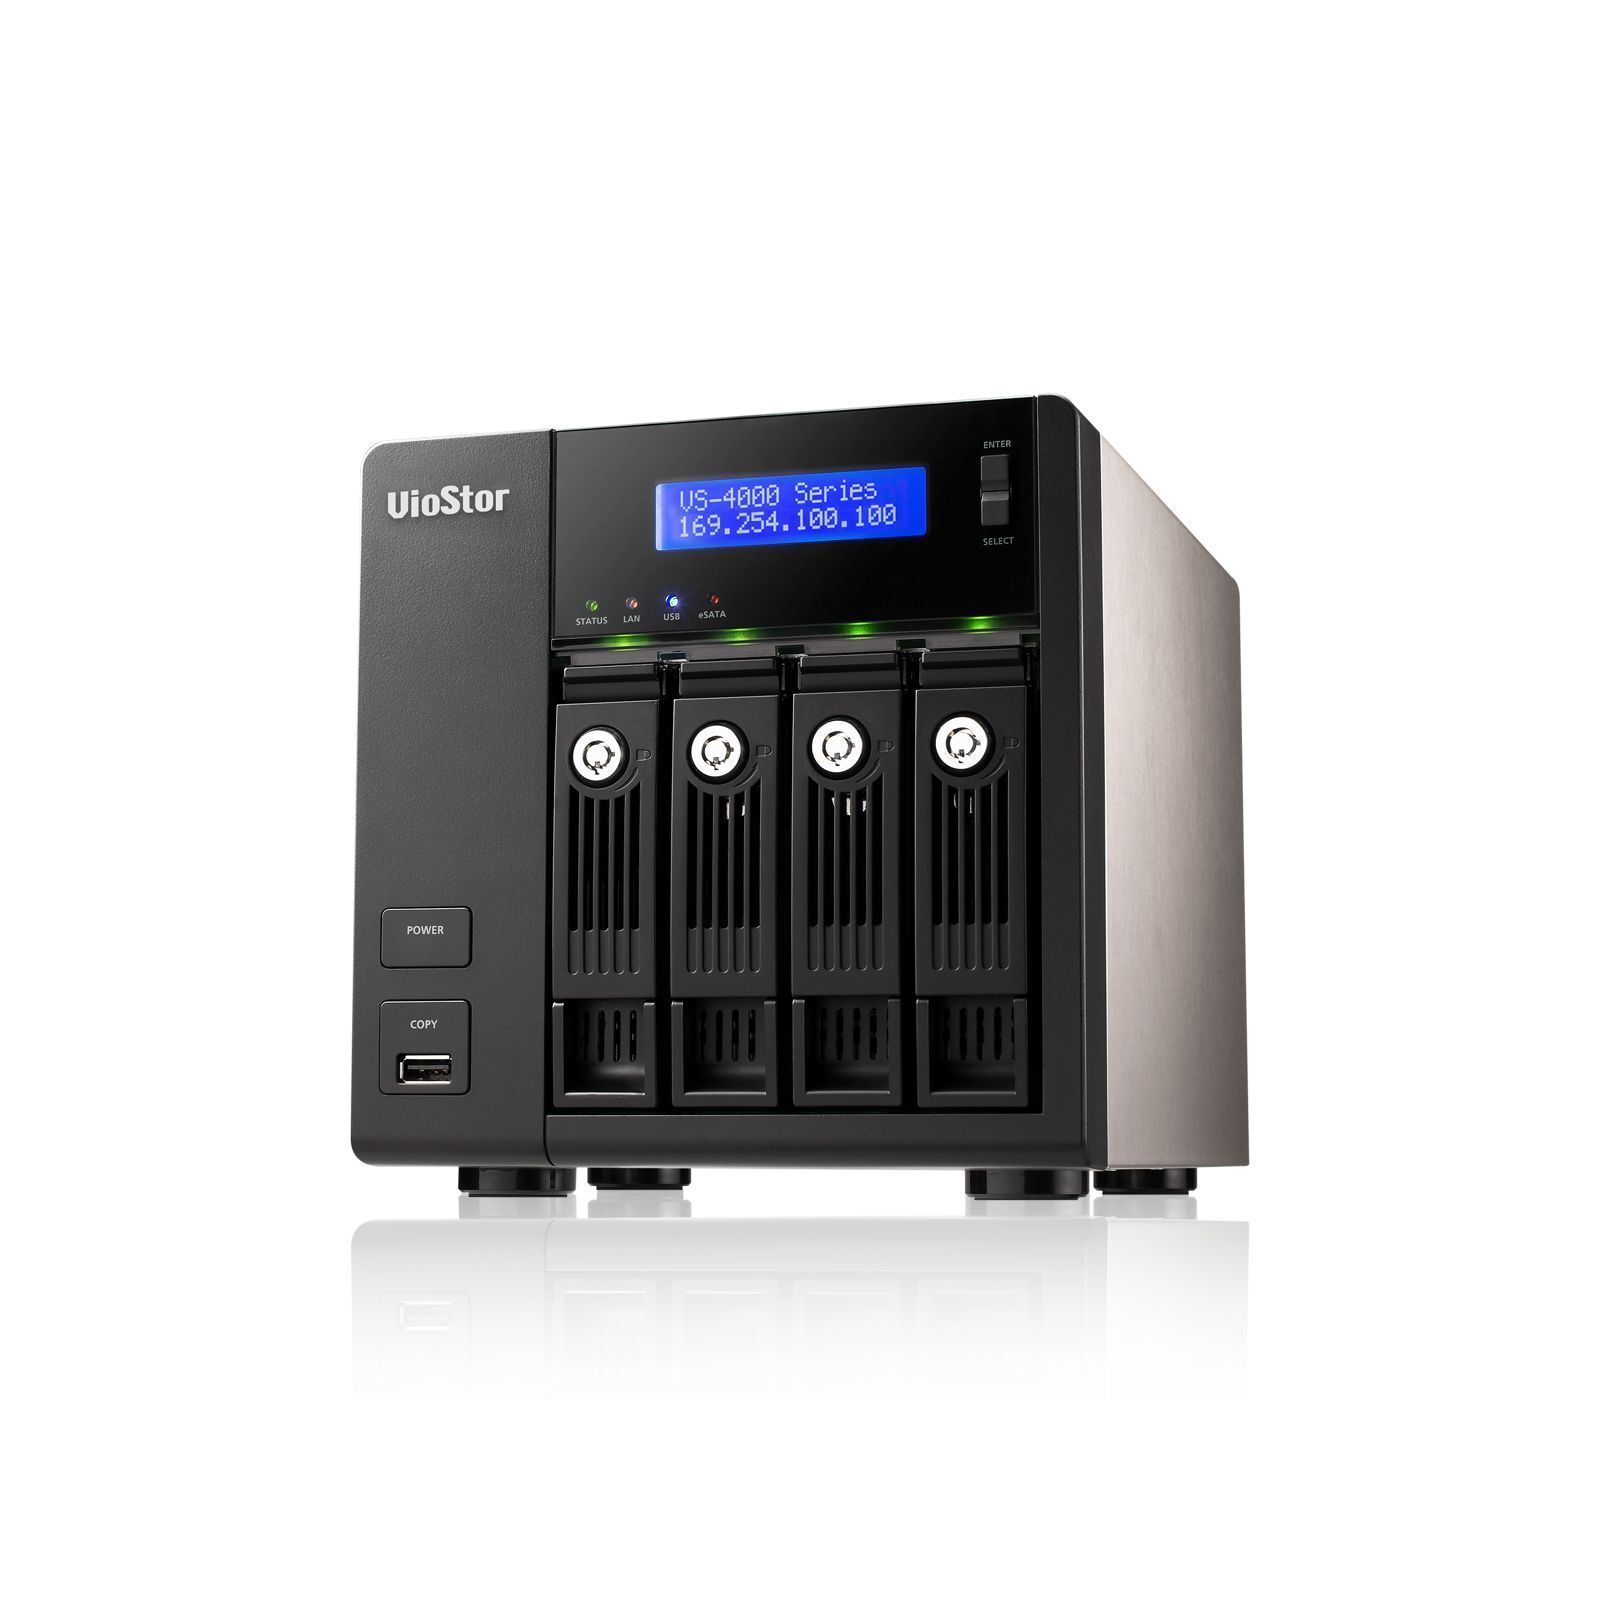 QNAP VS-4016 Pro NVR Drivers for Windows Download